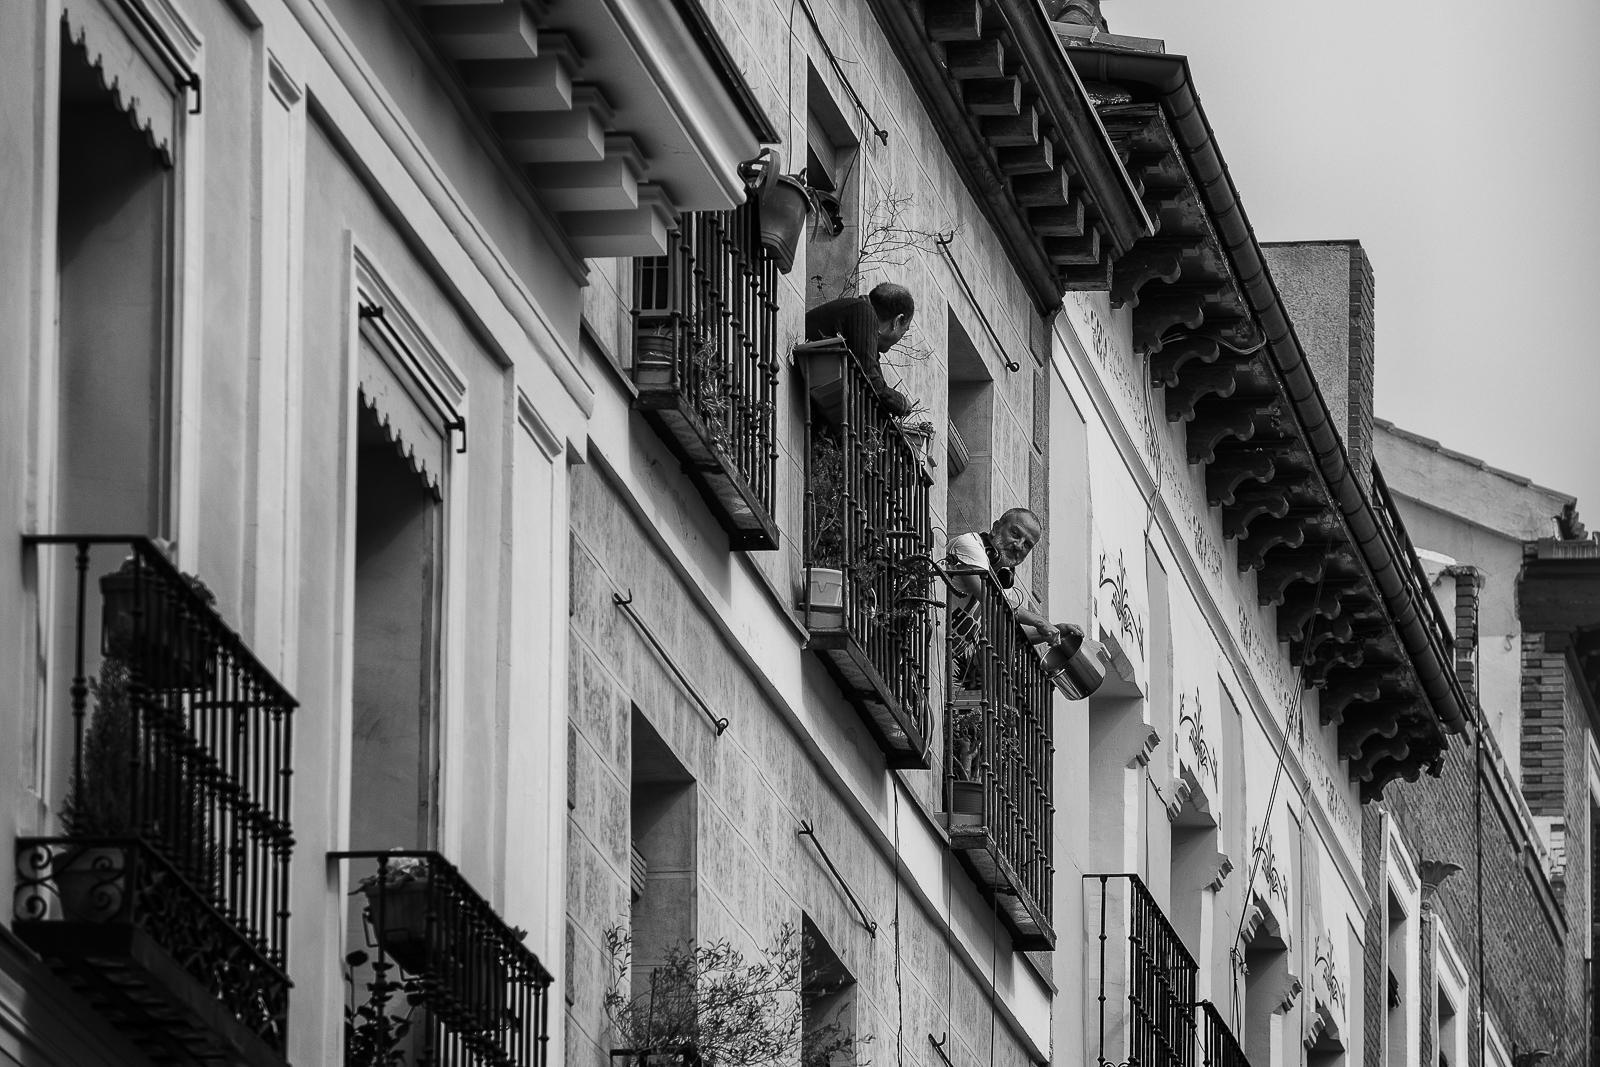 Two men talking from balcony to balcony during the coronavirus lockdown in Madrid city center.